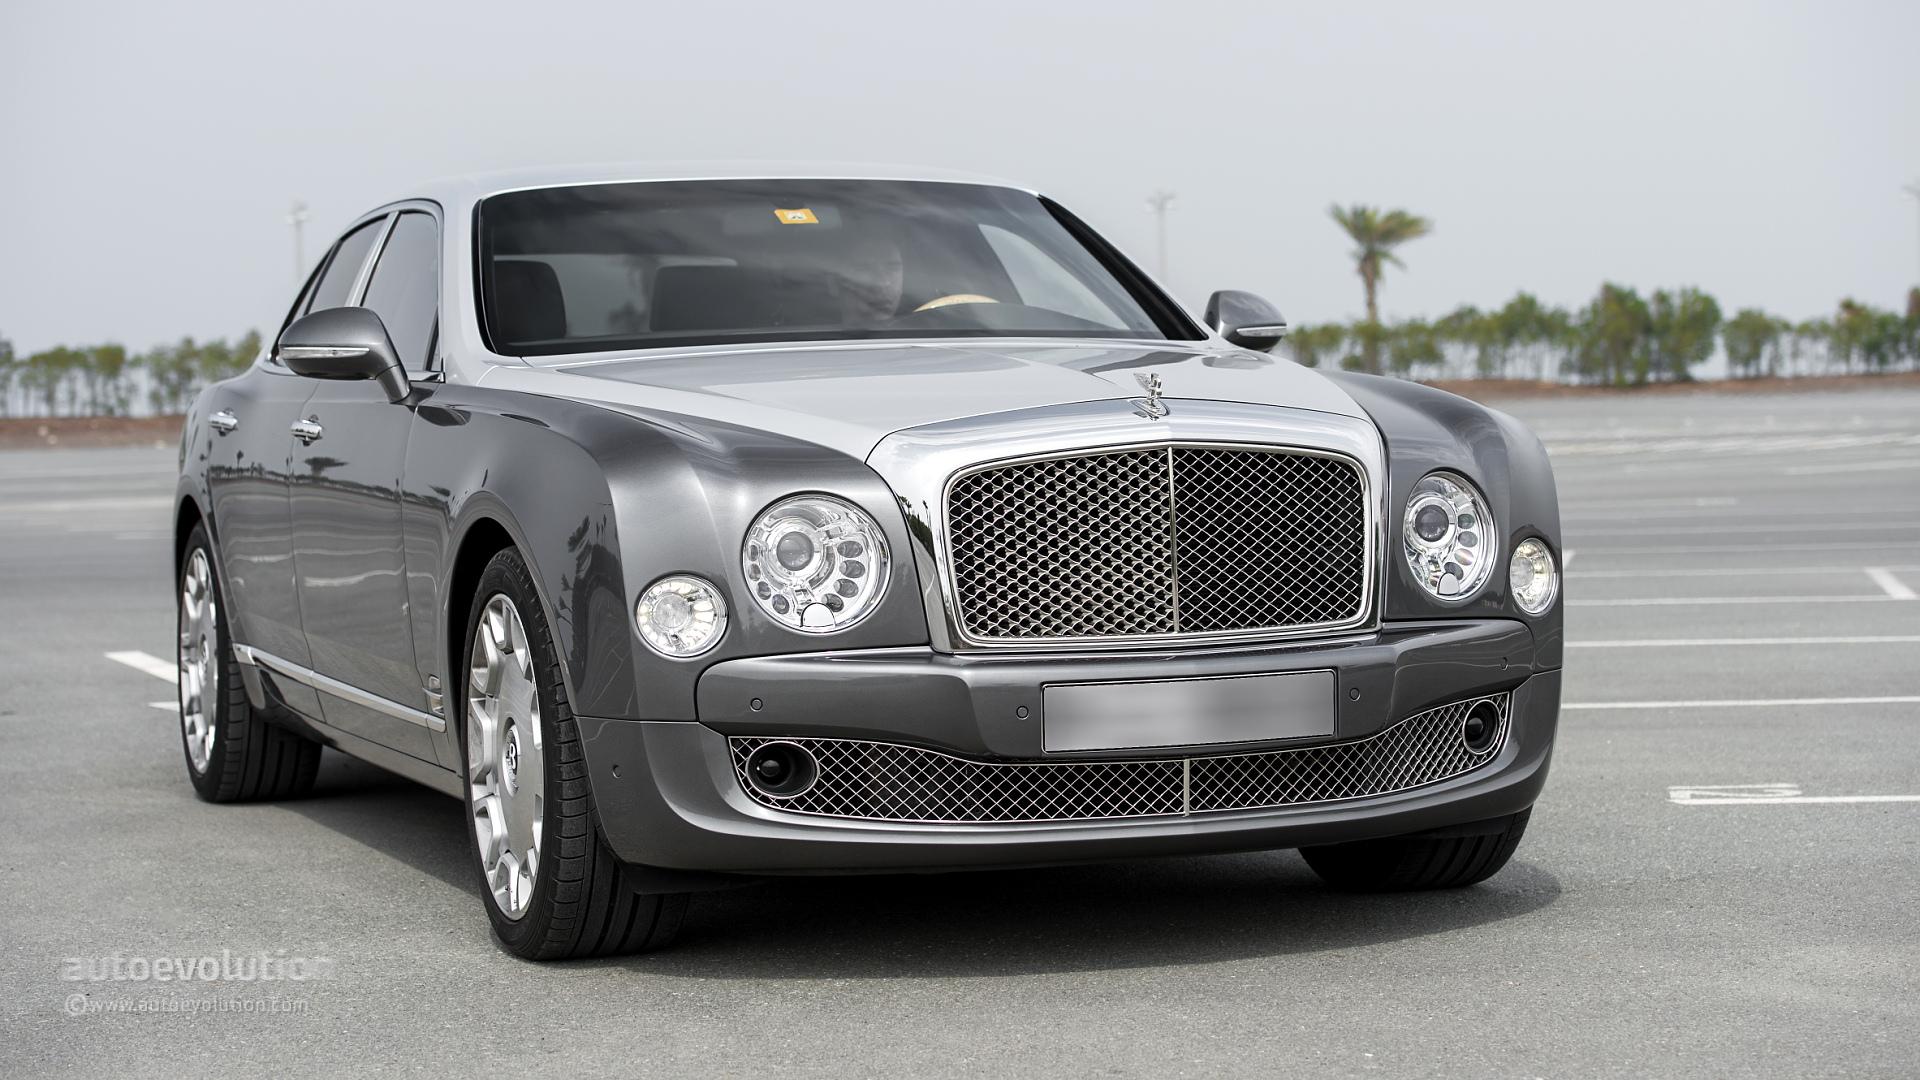 Bentley mulsanne review autoevolution photo gallery 78 vanachro Images